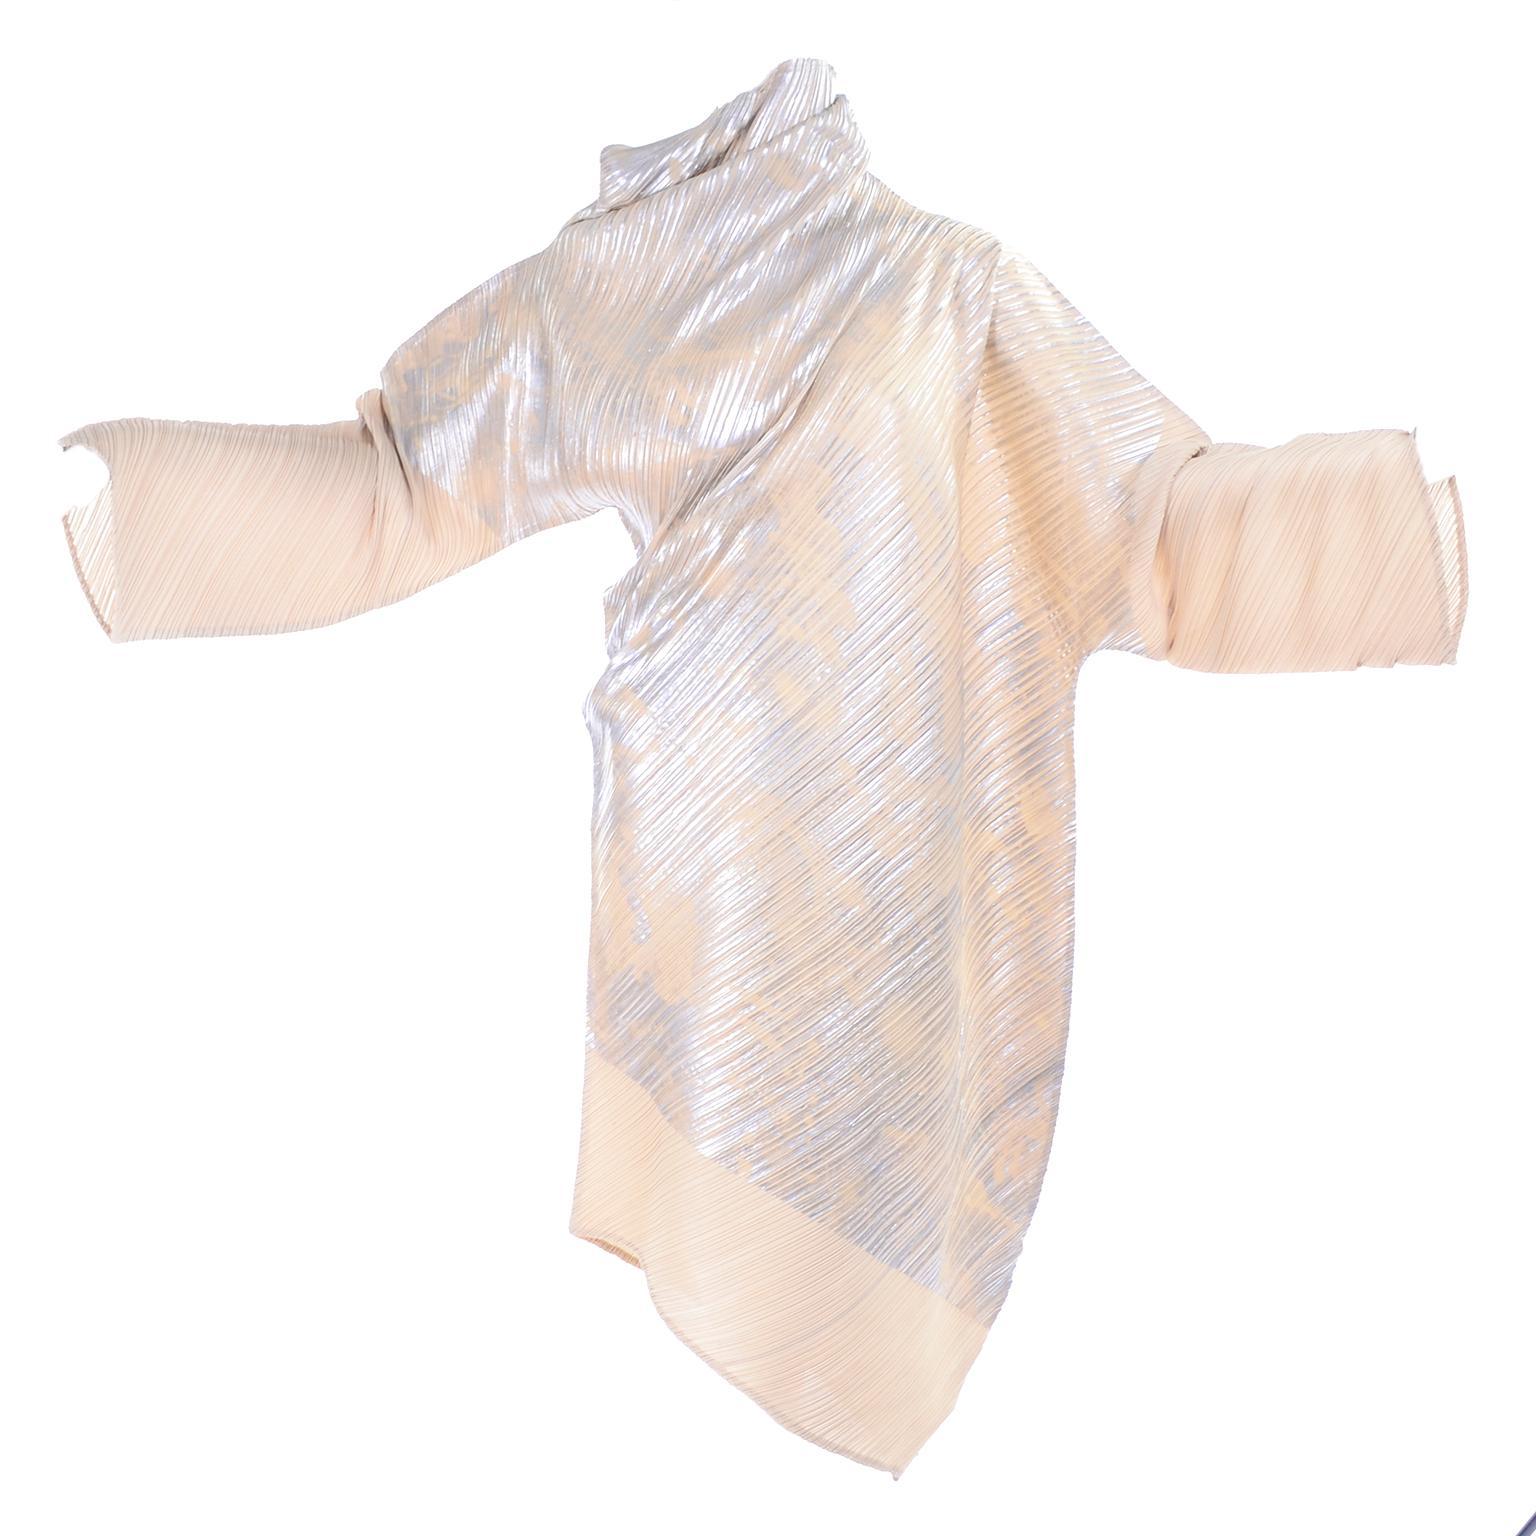 Issey Miyake A/H 1994 Asymmetrical Pleated Dress Cream & Silver Metallic w/ Tags